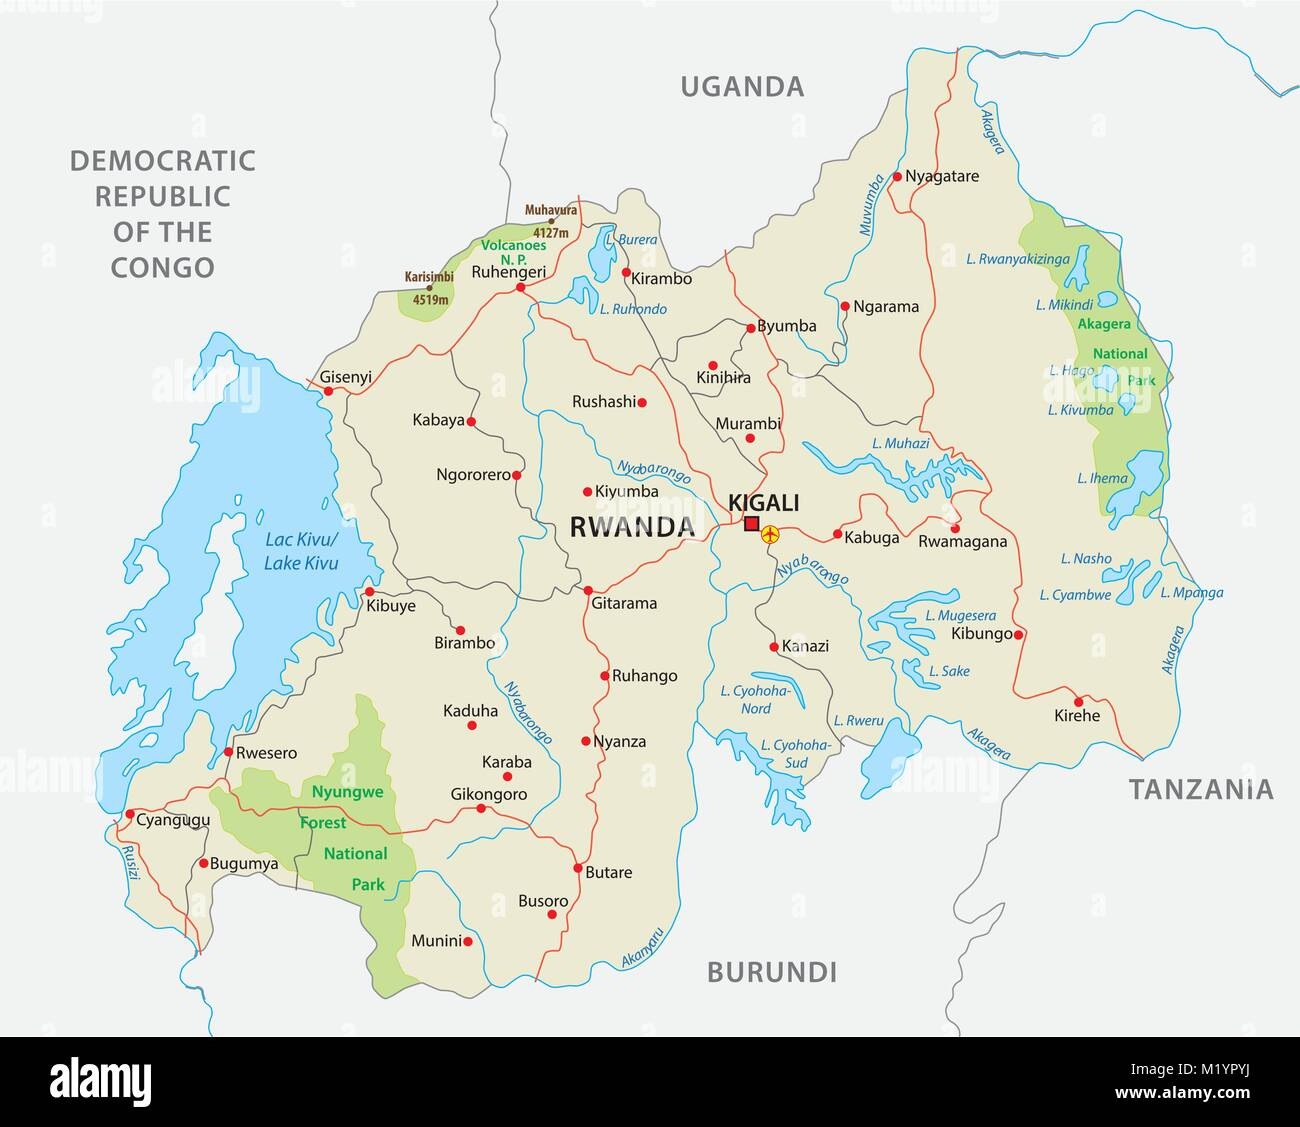 rwanda road and national park vector map - Stock Vector